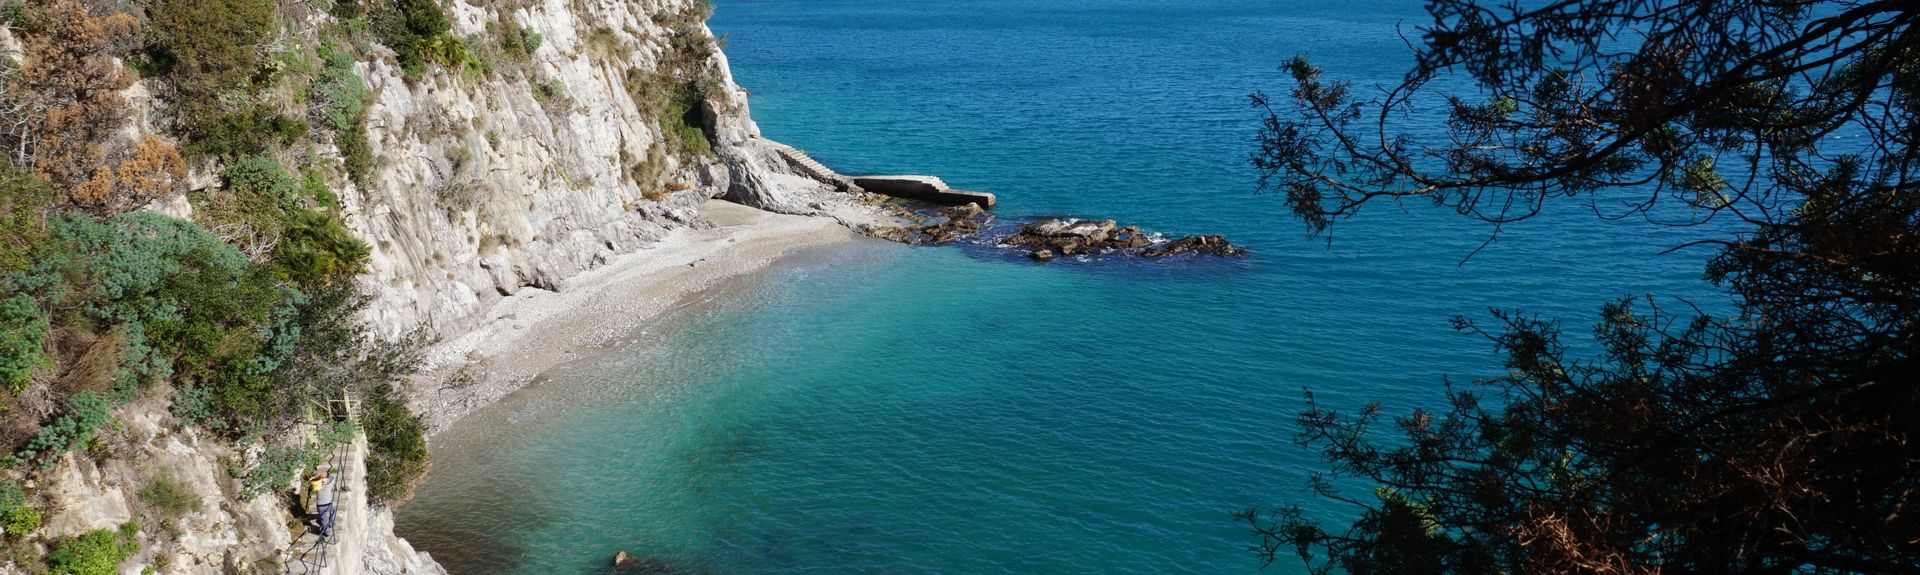 Sarno, Salerno, Campania, Italy